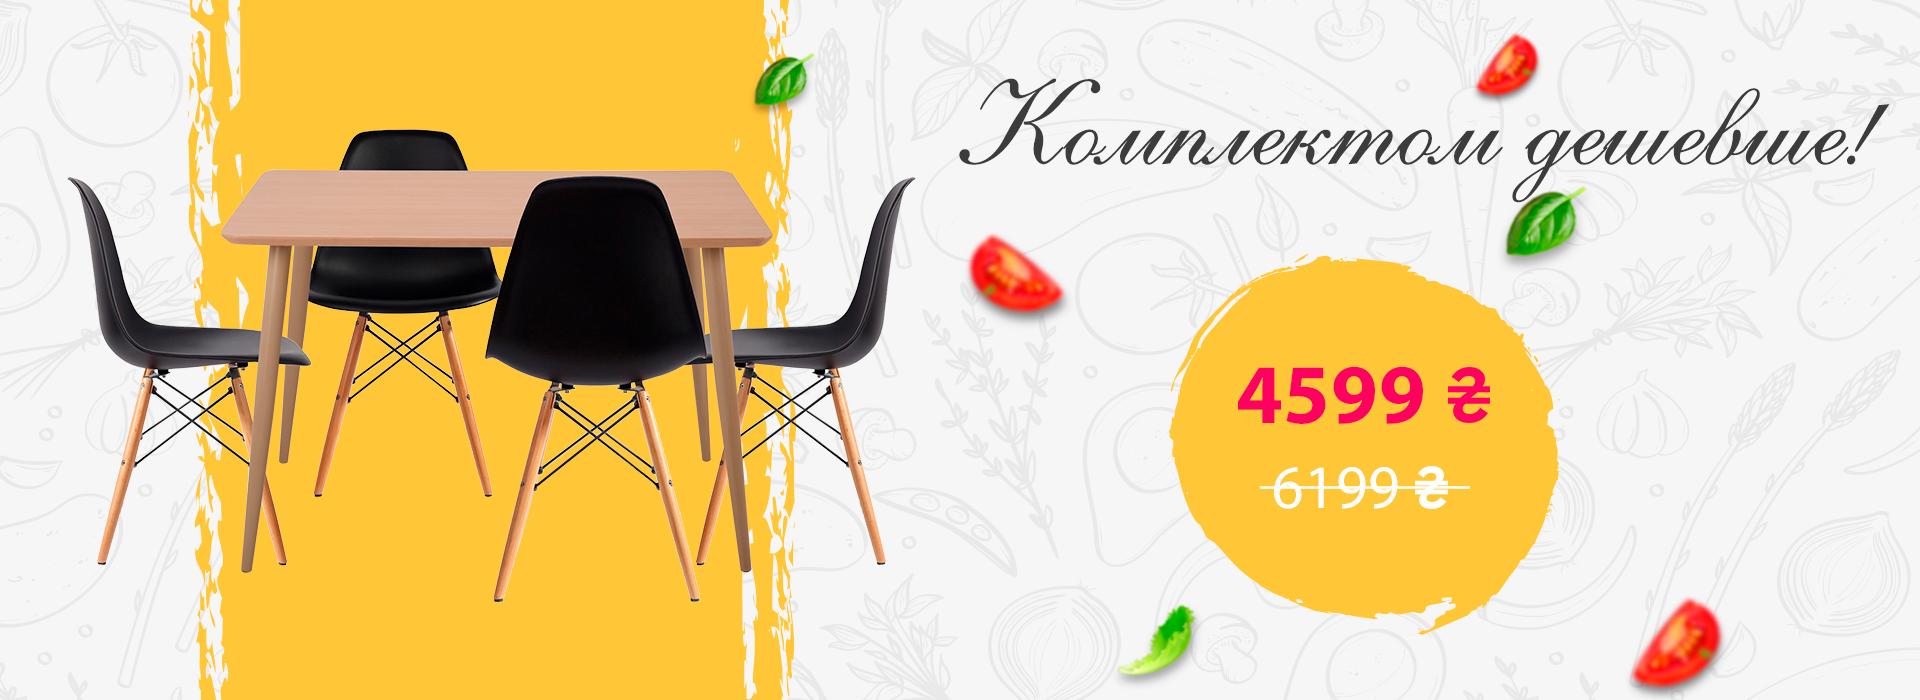 Stock! Discount on GT kitchen furniture set!